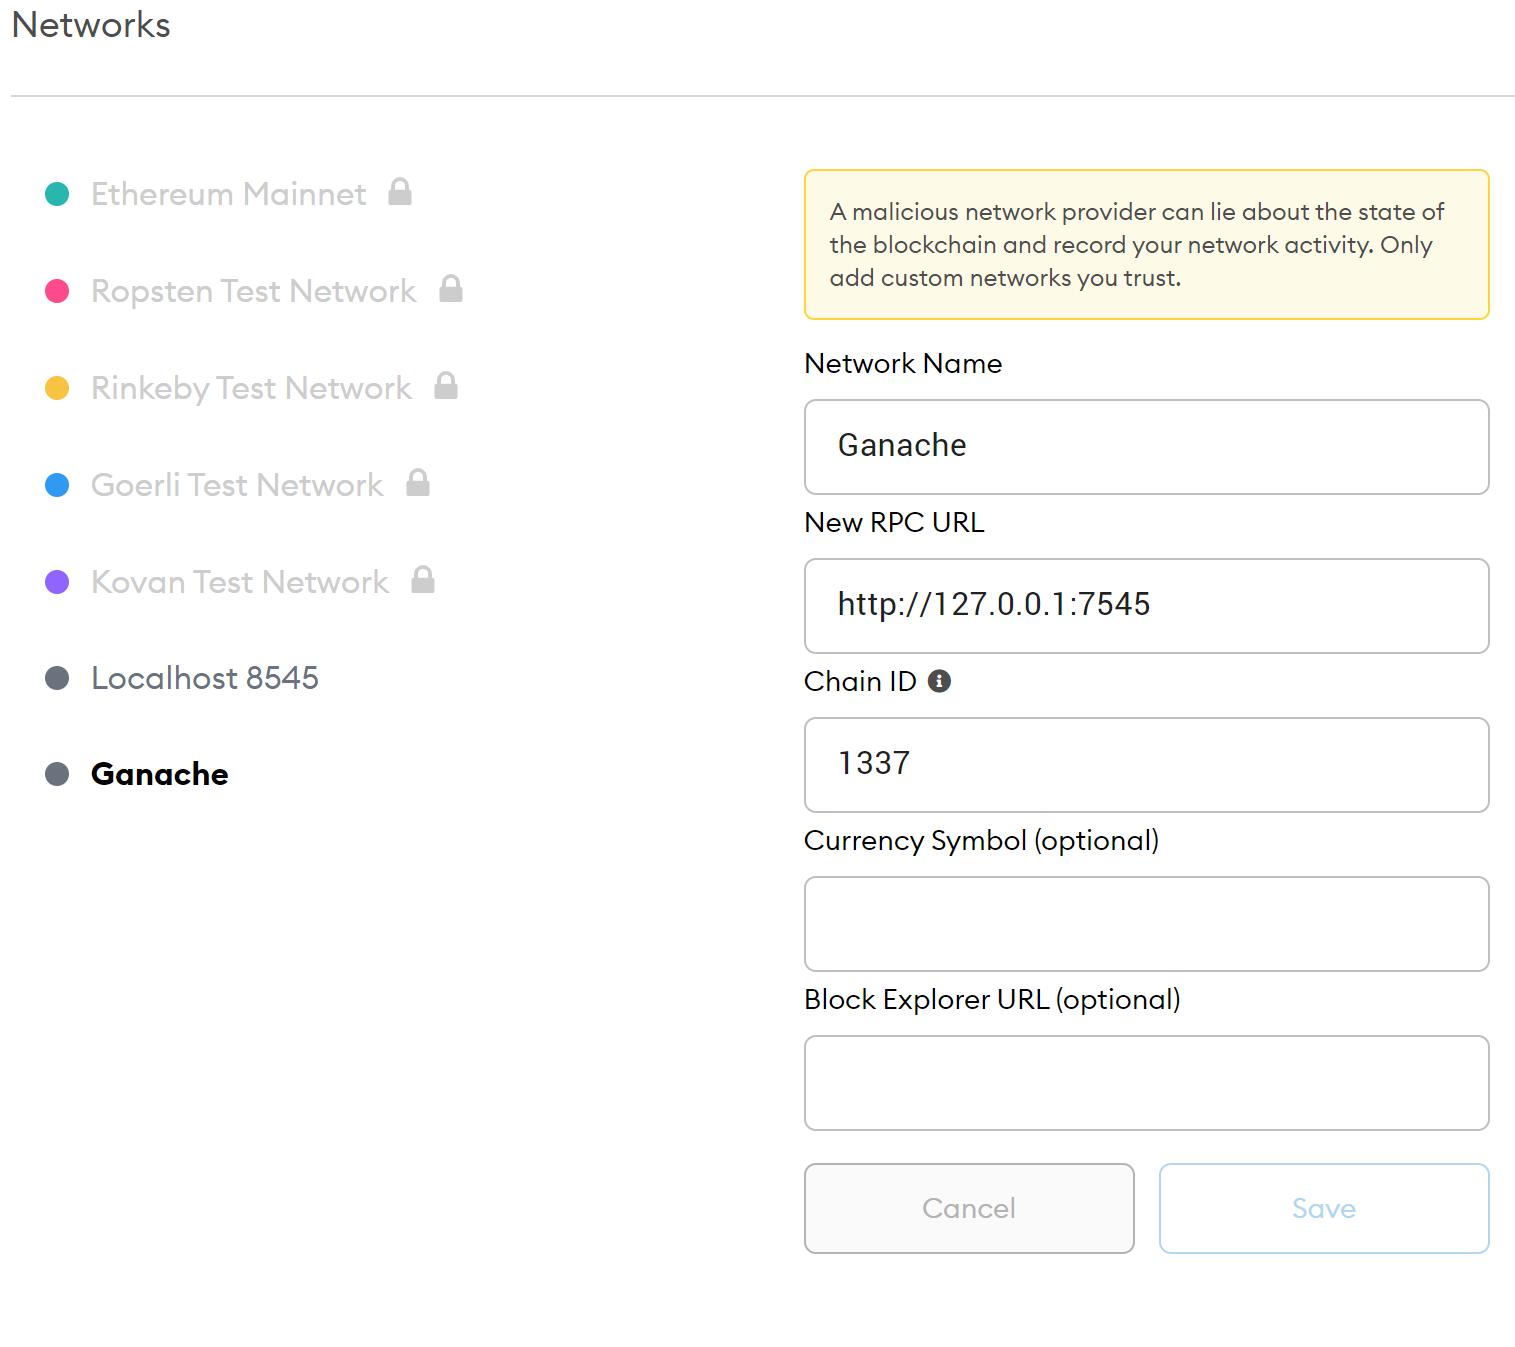 Simple Benchmarking Contract - 简单基准合同